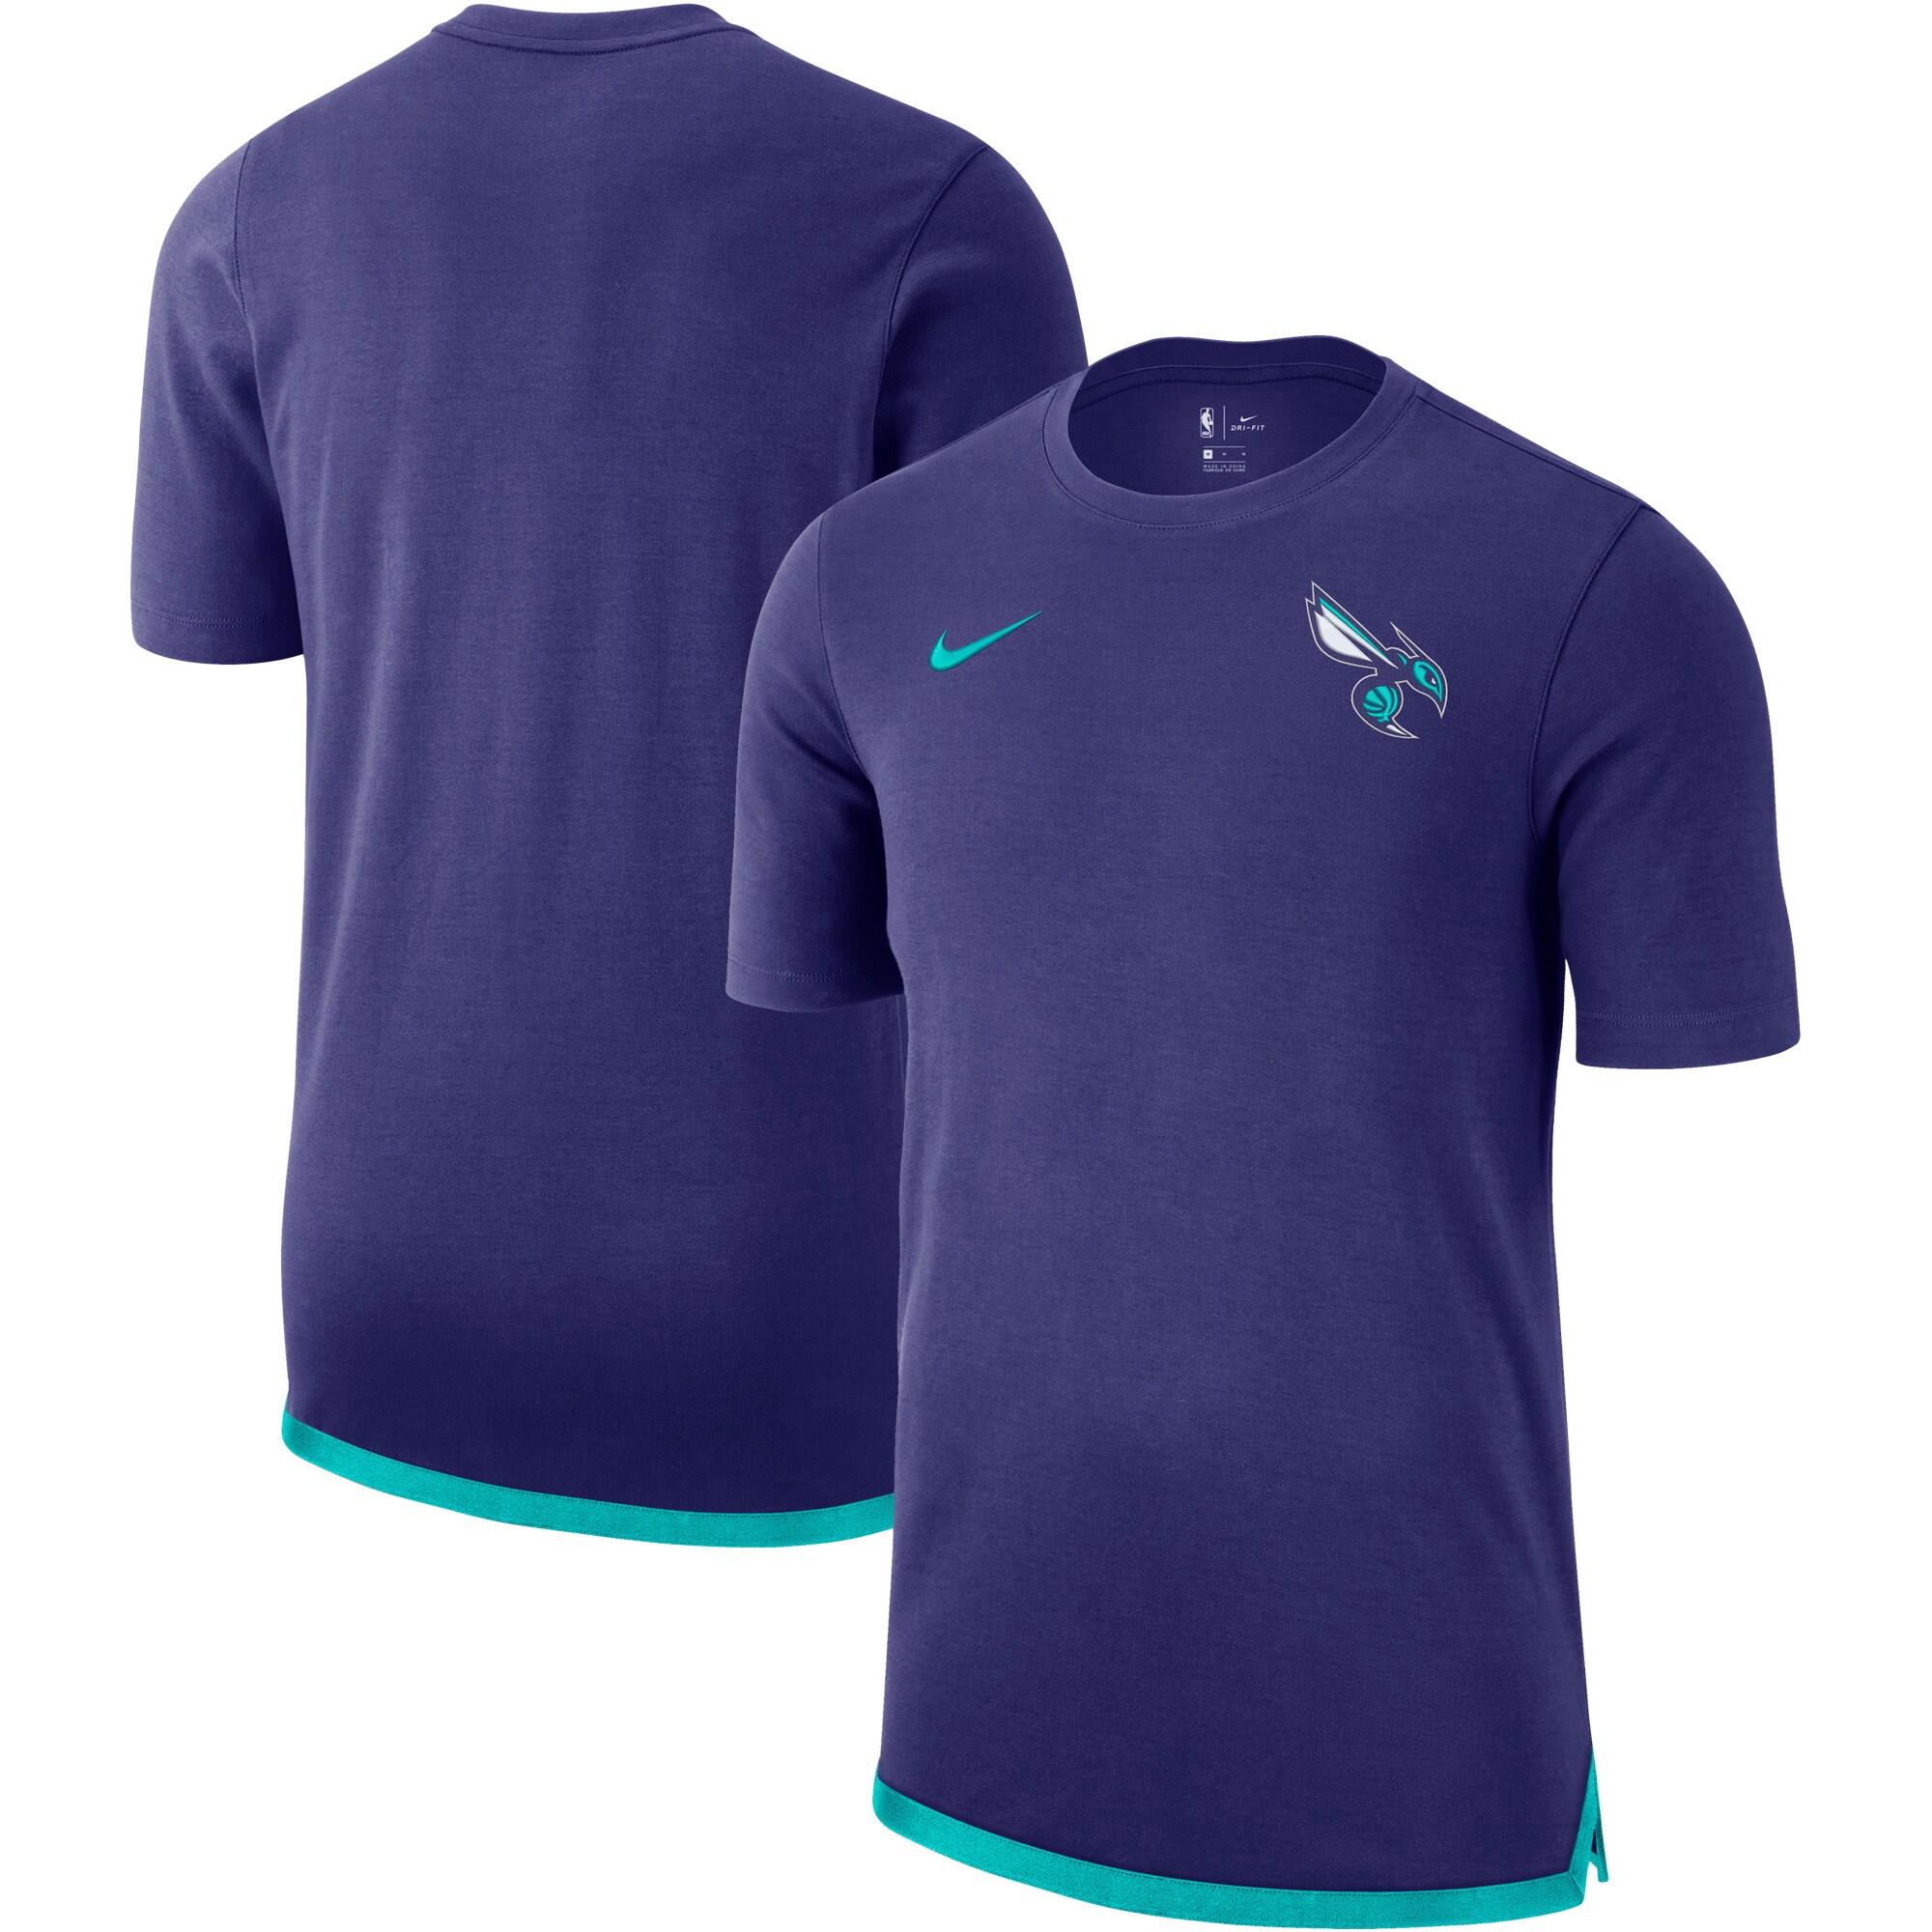 Charlotte Hornets Nike Essential Uniform DNA T-Shirt - Purple